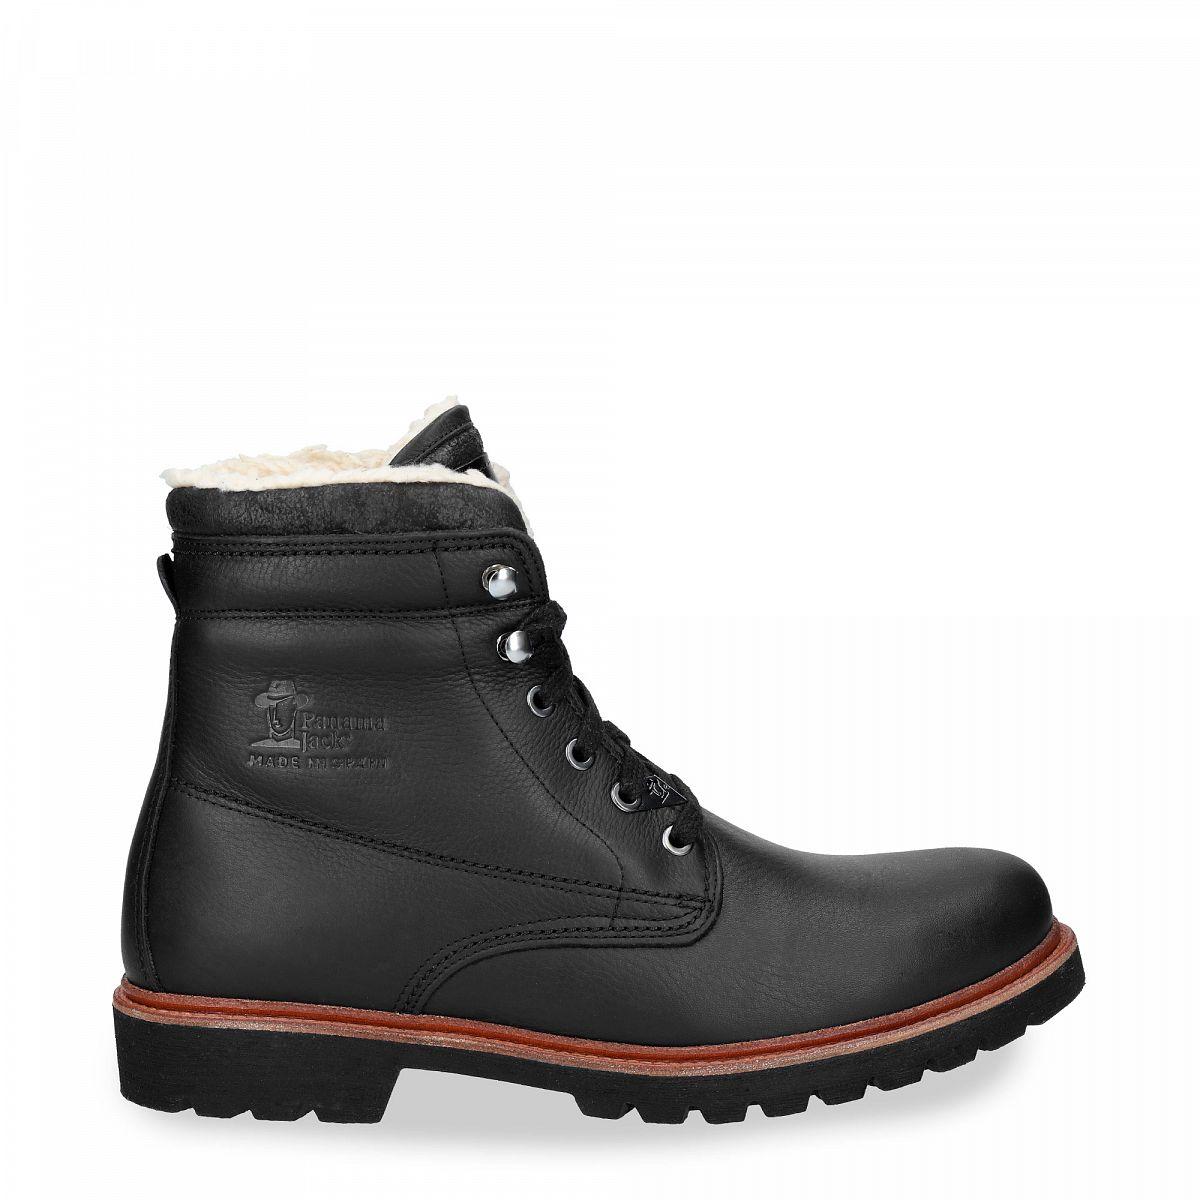 81355bb536e Bota de piel negro con forro de algodón